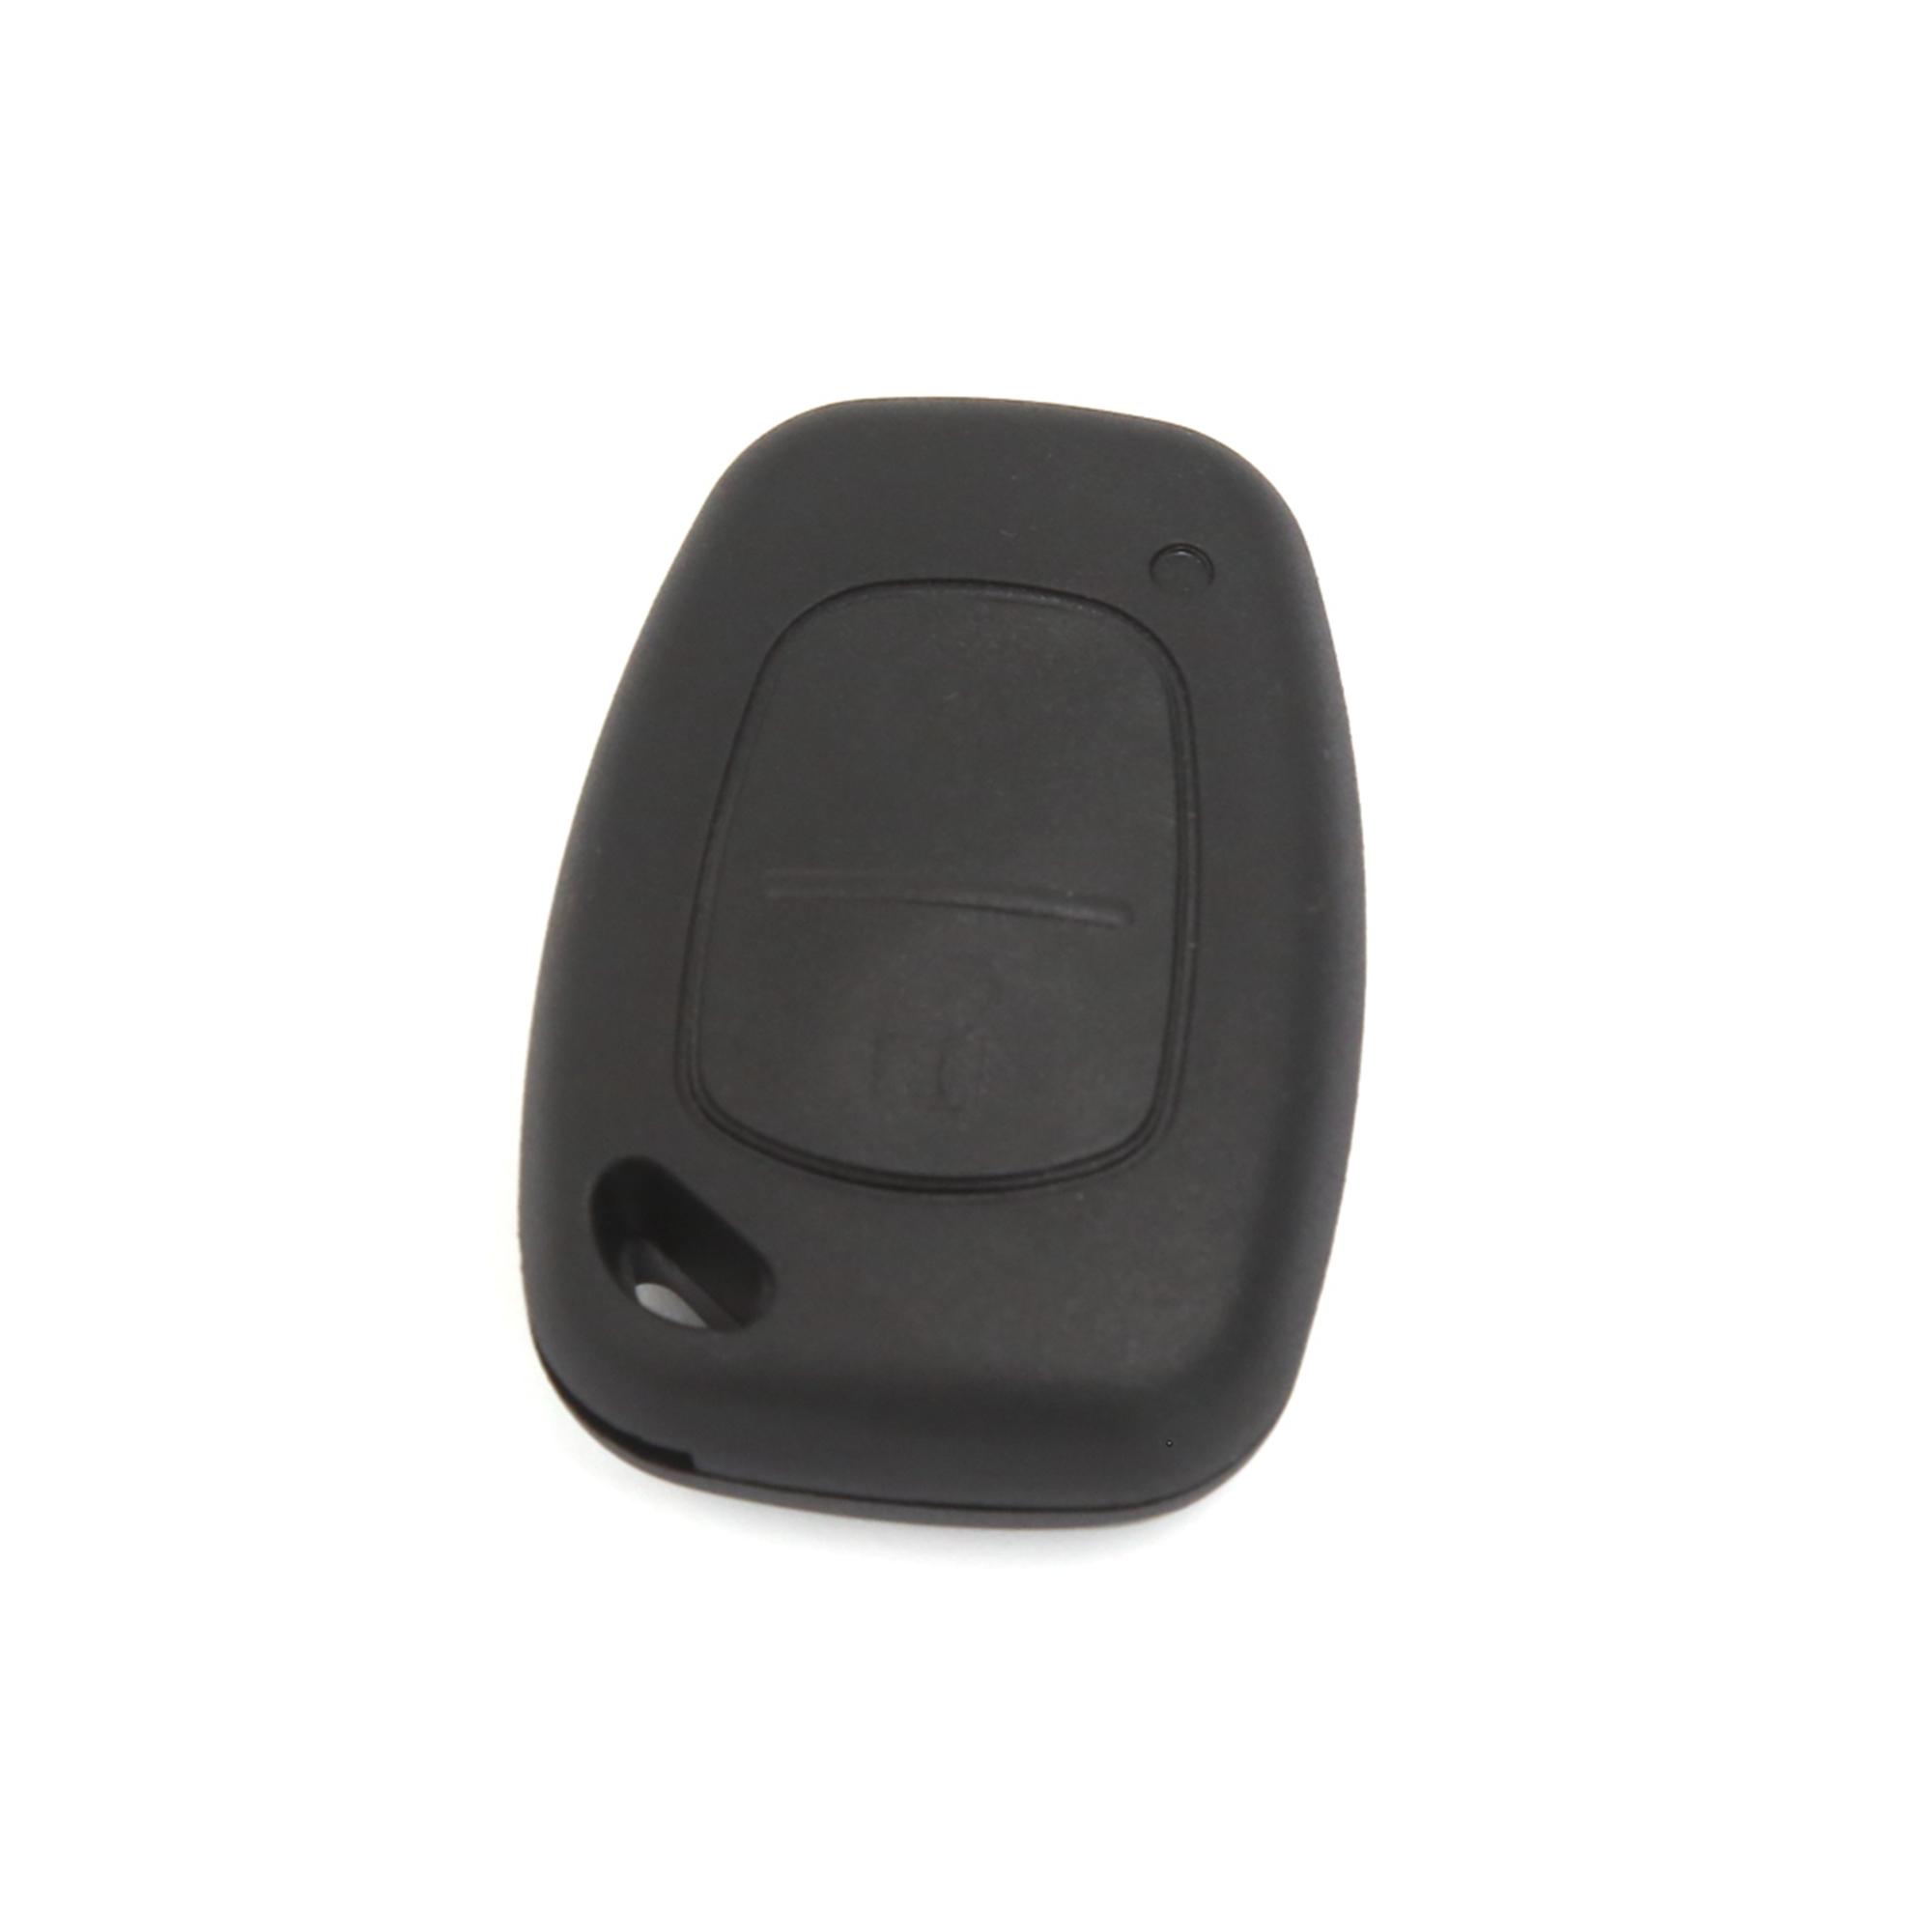 Remote Key Fob Case for Opel Vauxhall Vivaro Renault Traffic Nissan Primastar